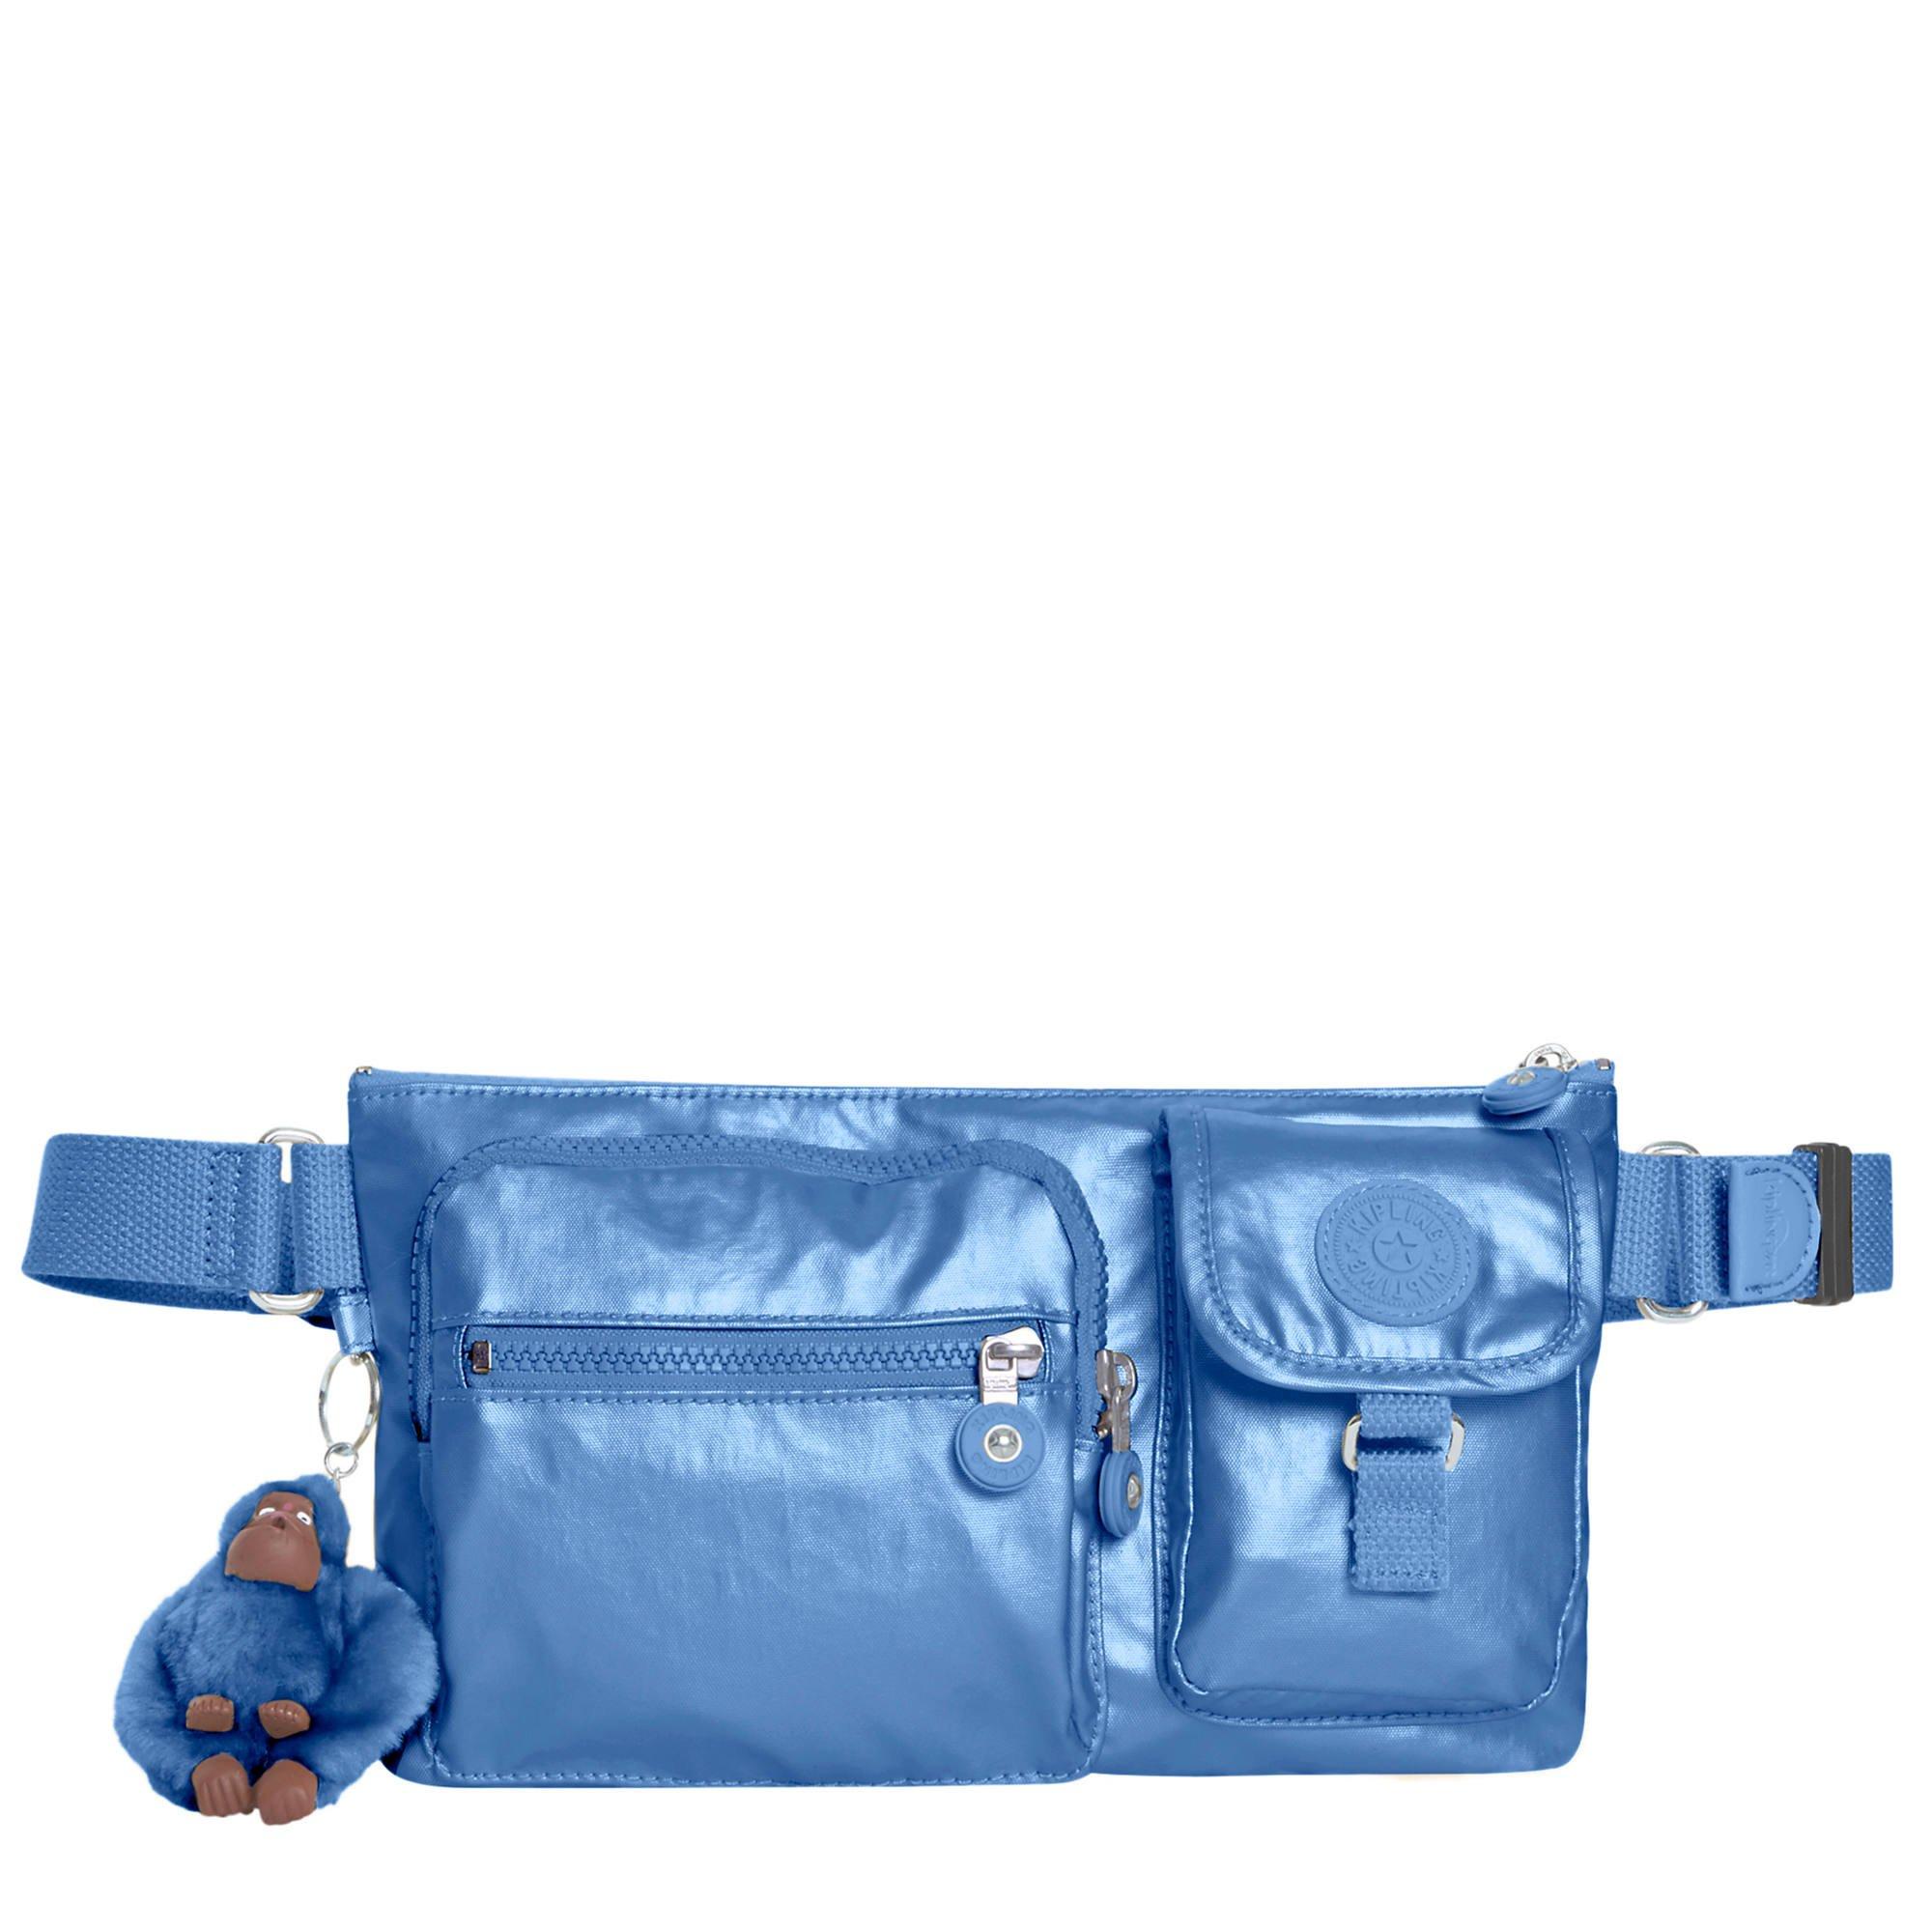 Kipling Women's Presto Metallic Convertible Waistpack, Mtlcsubdvb